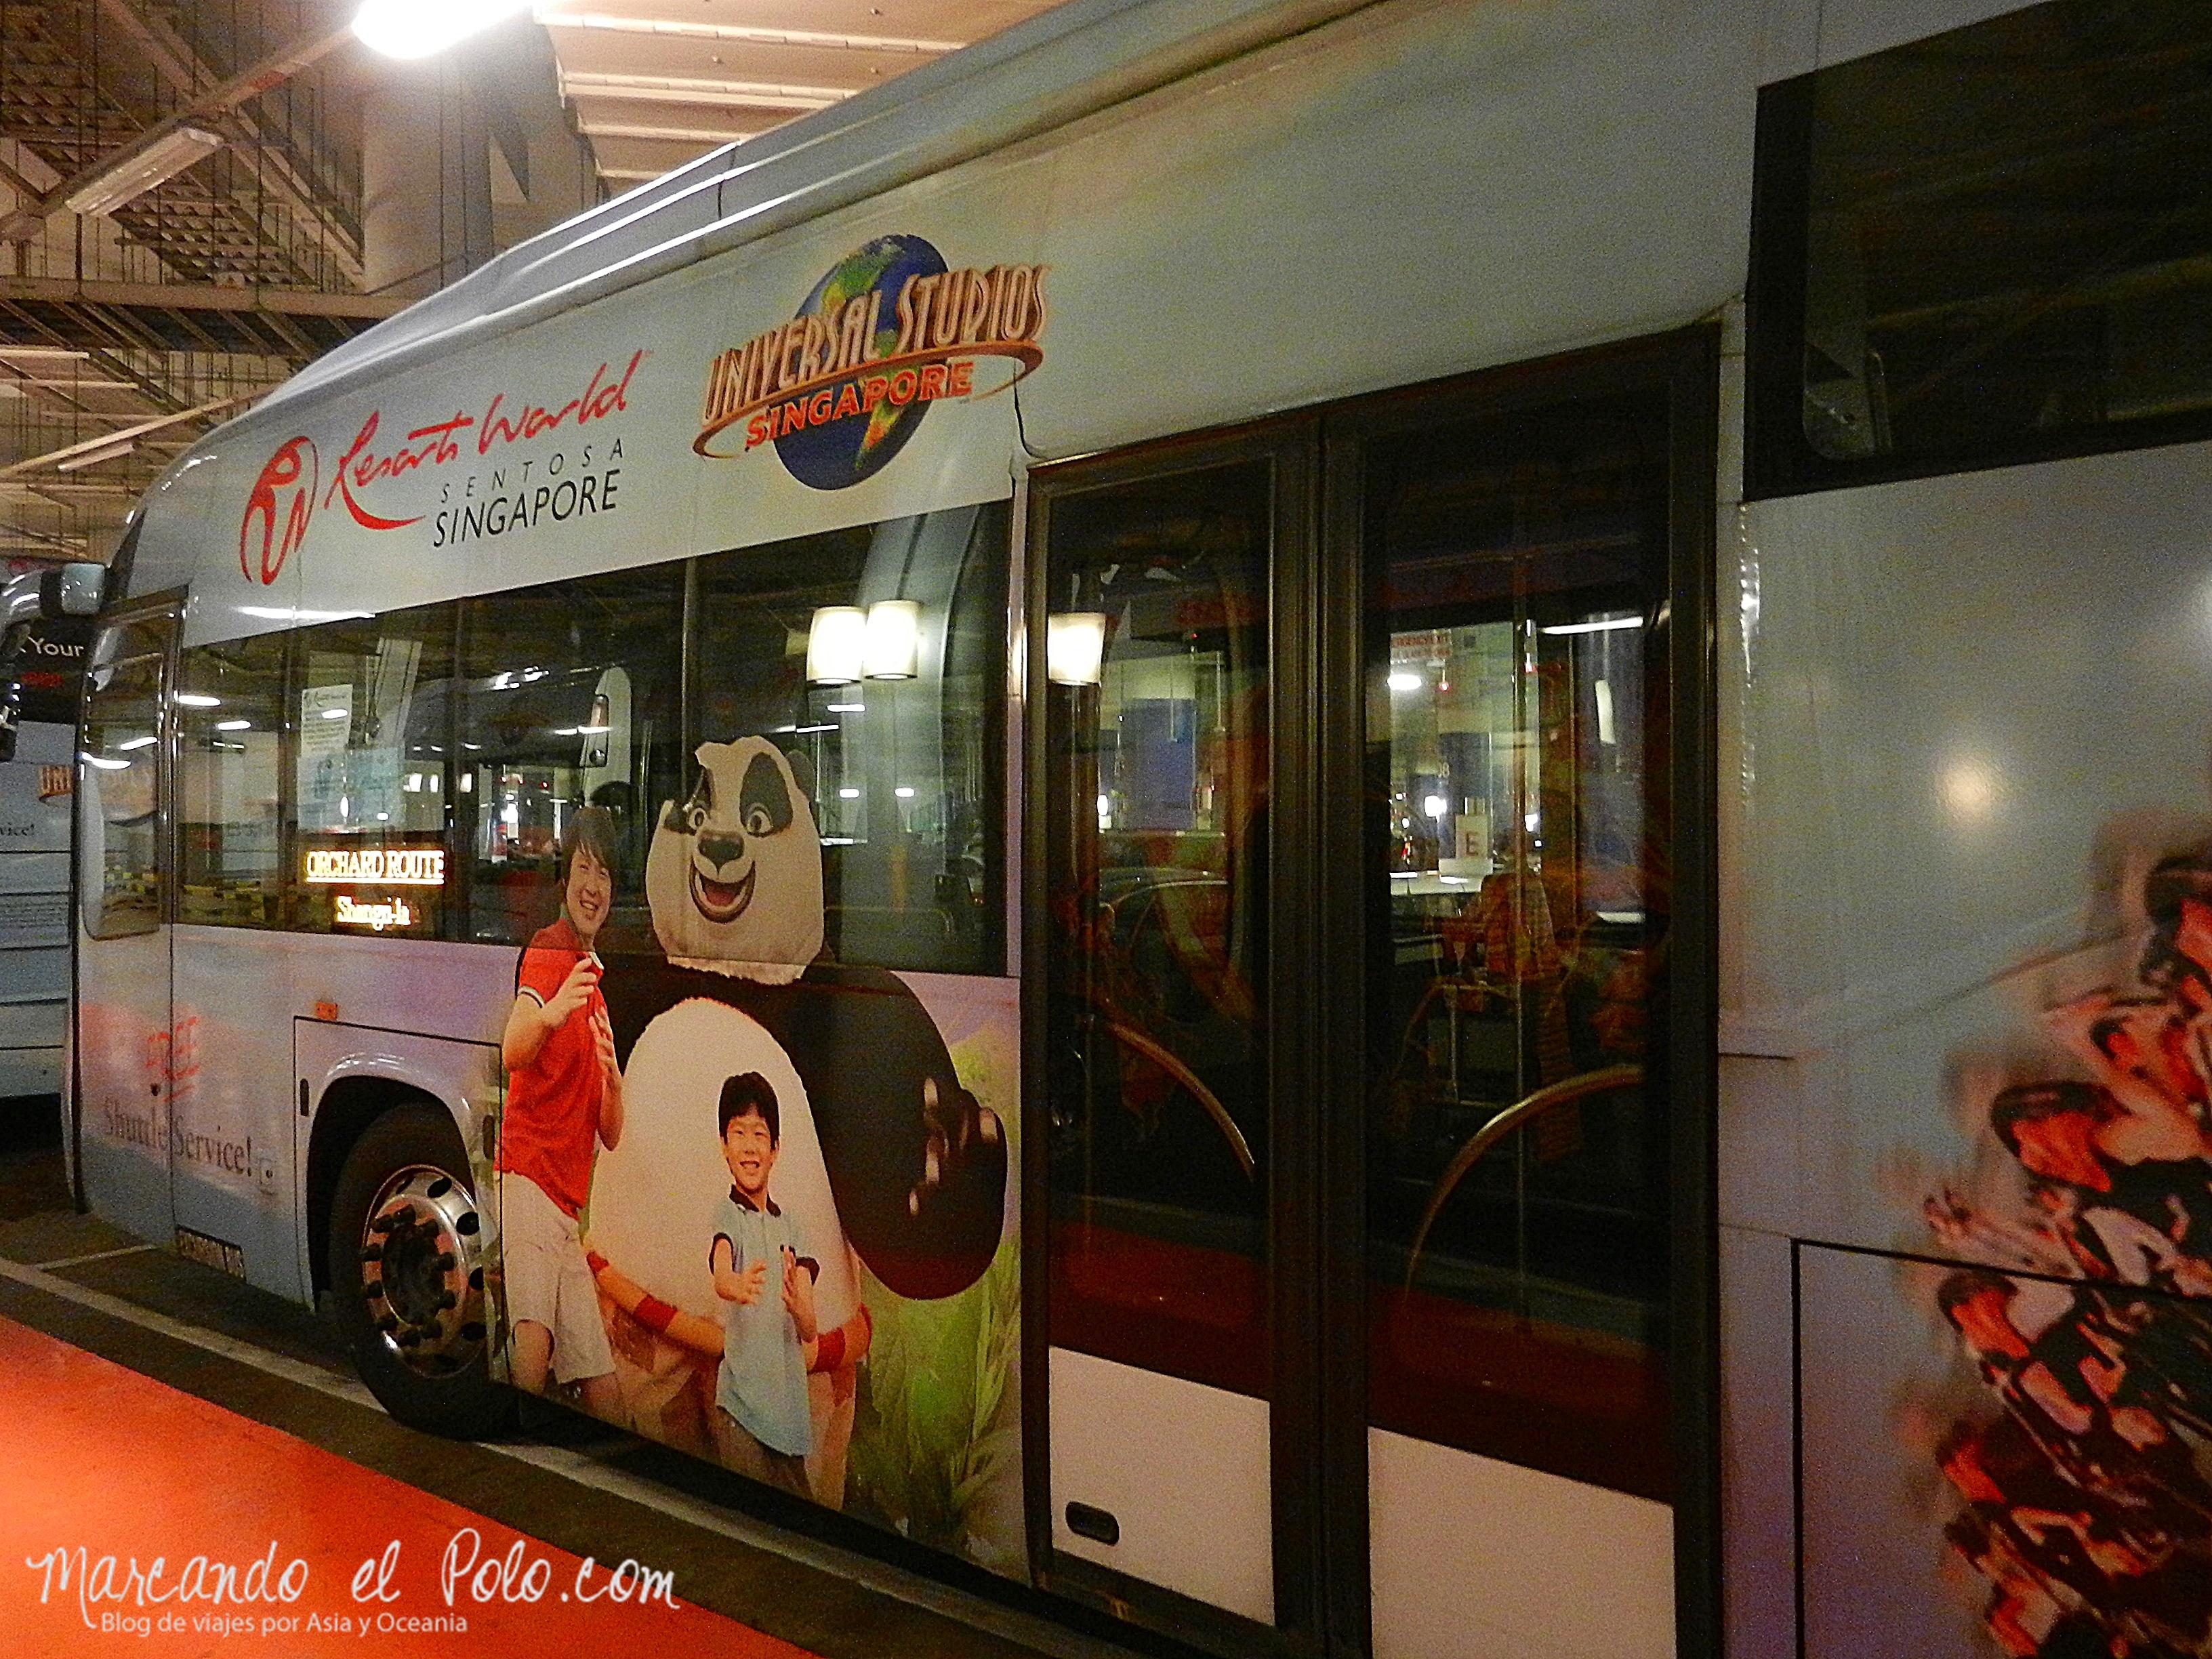 Bus gratis a Sentosa. Singapur